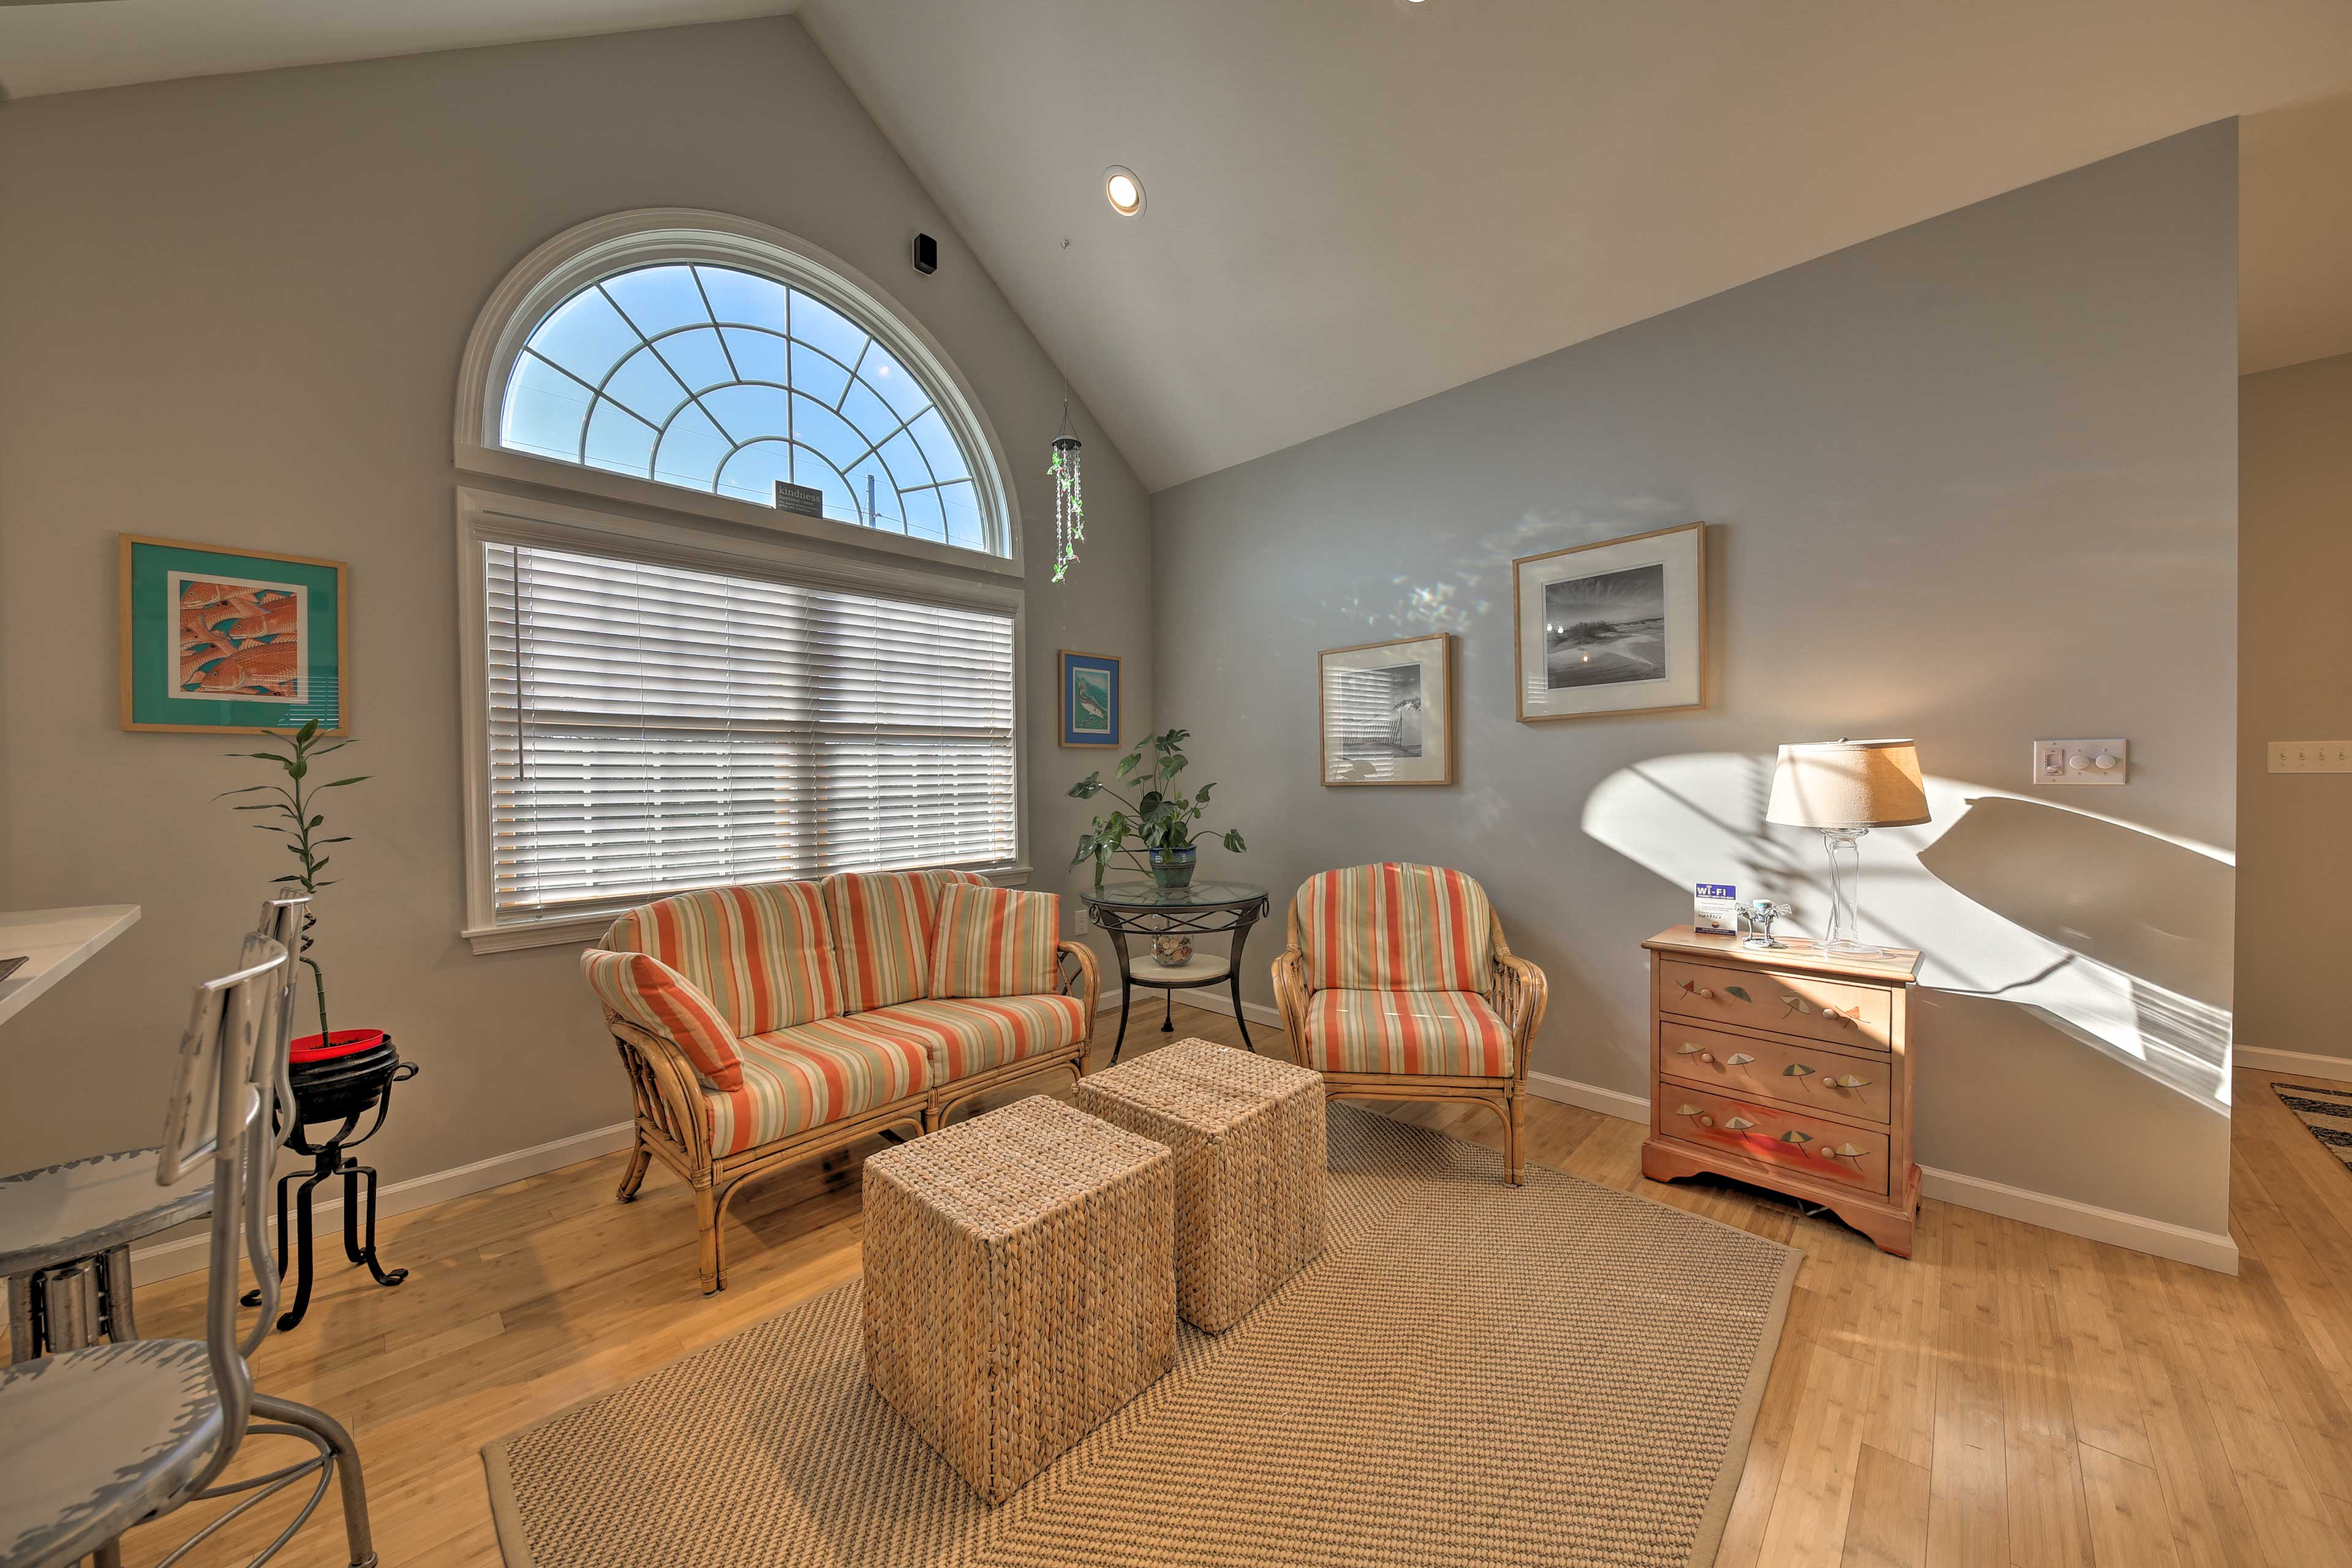 Lofted ceilings create a warm, inviting interior.